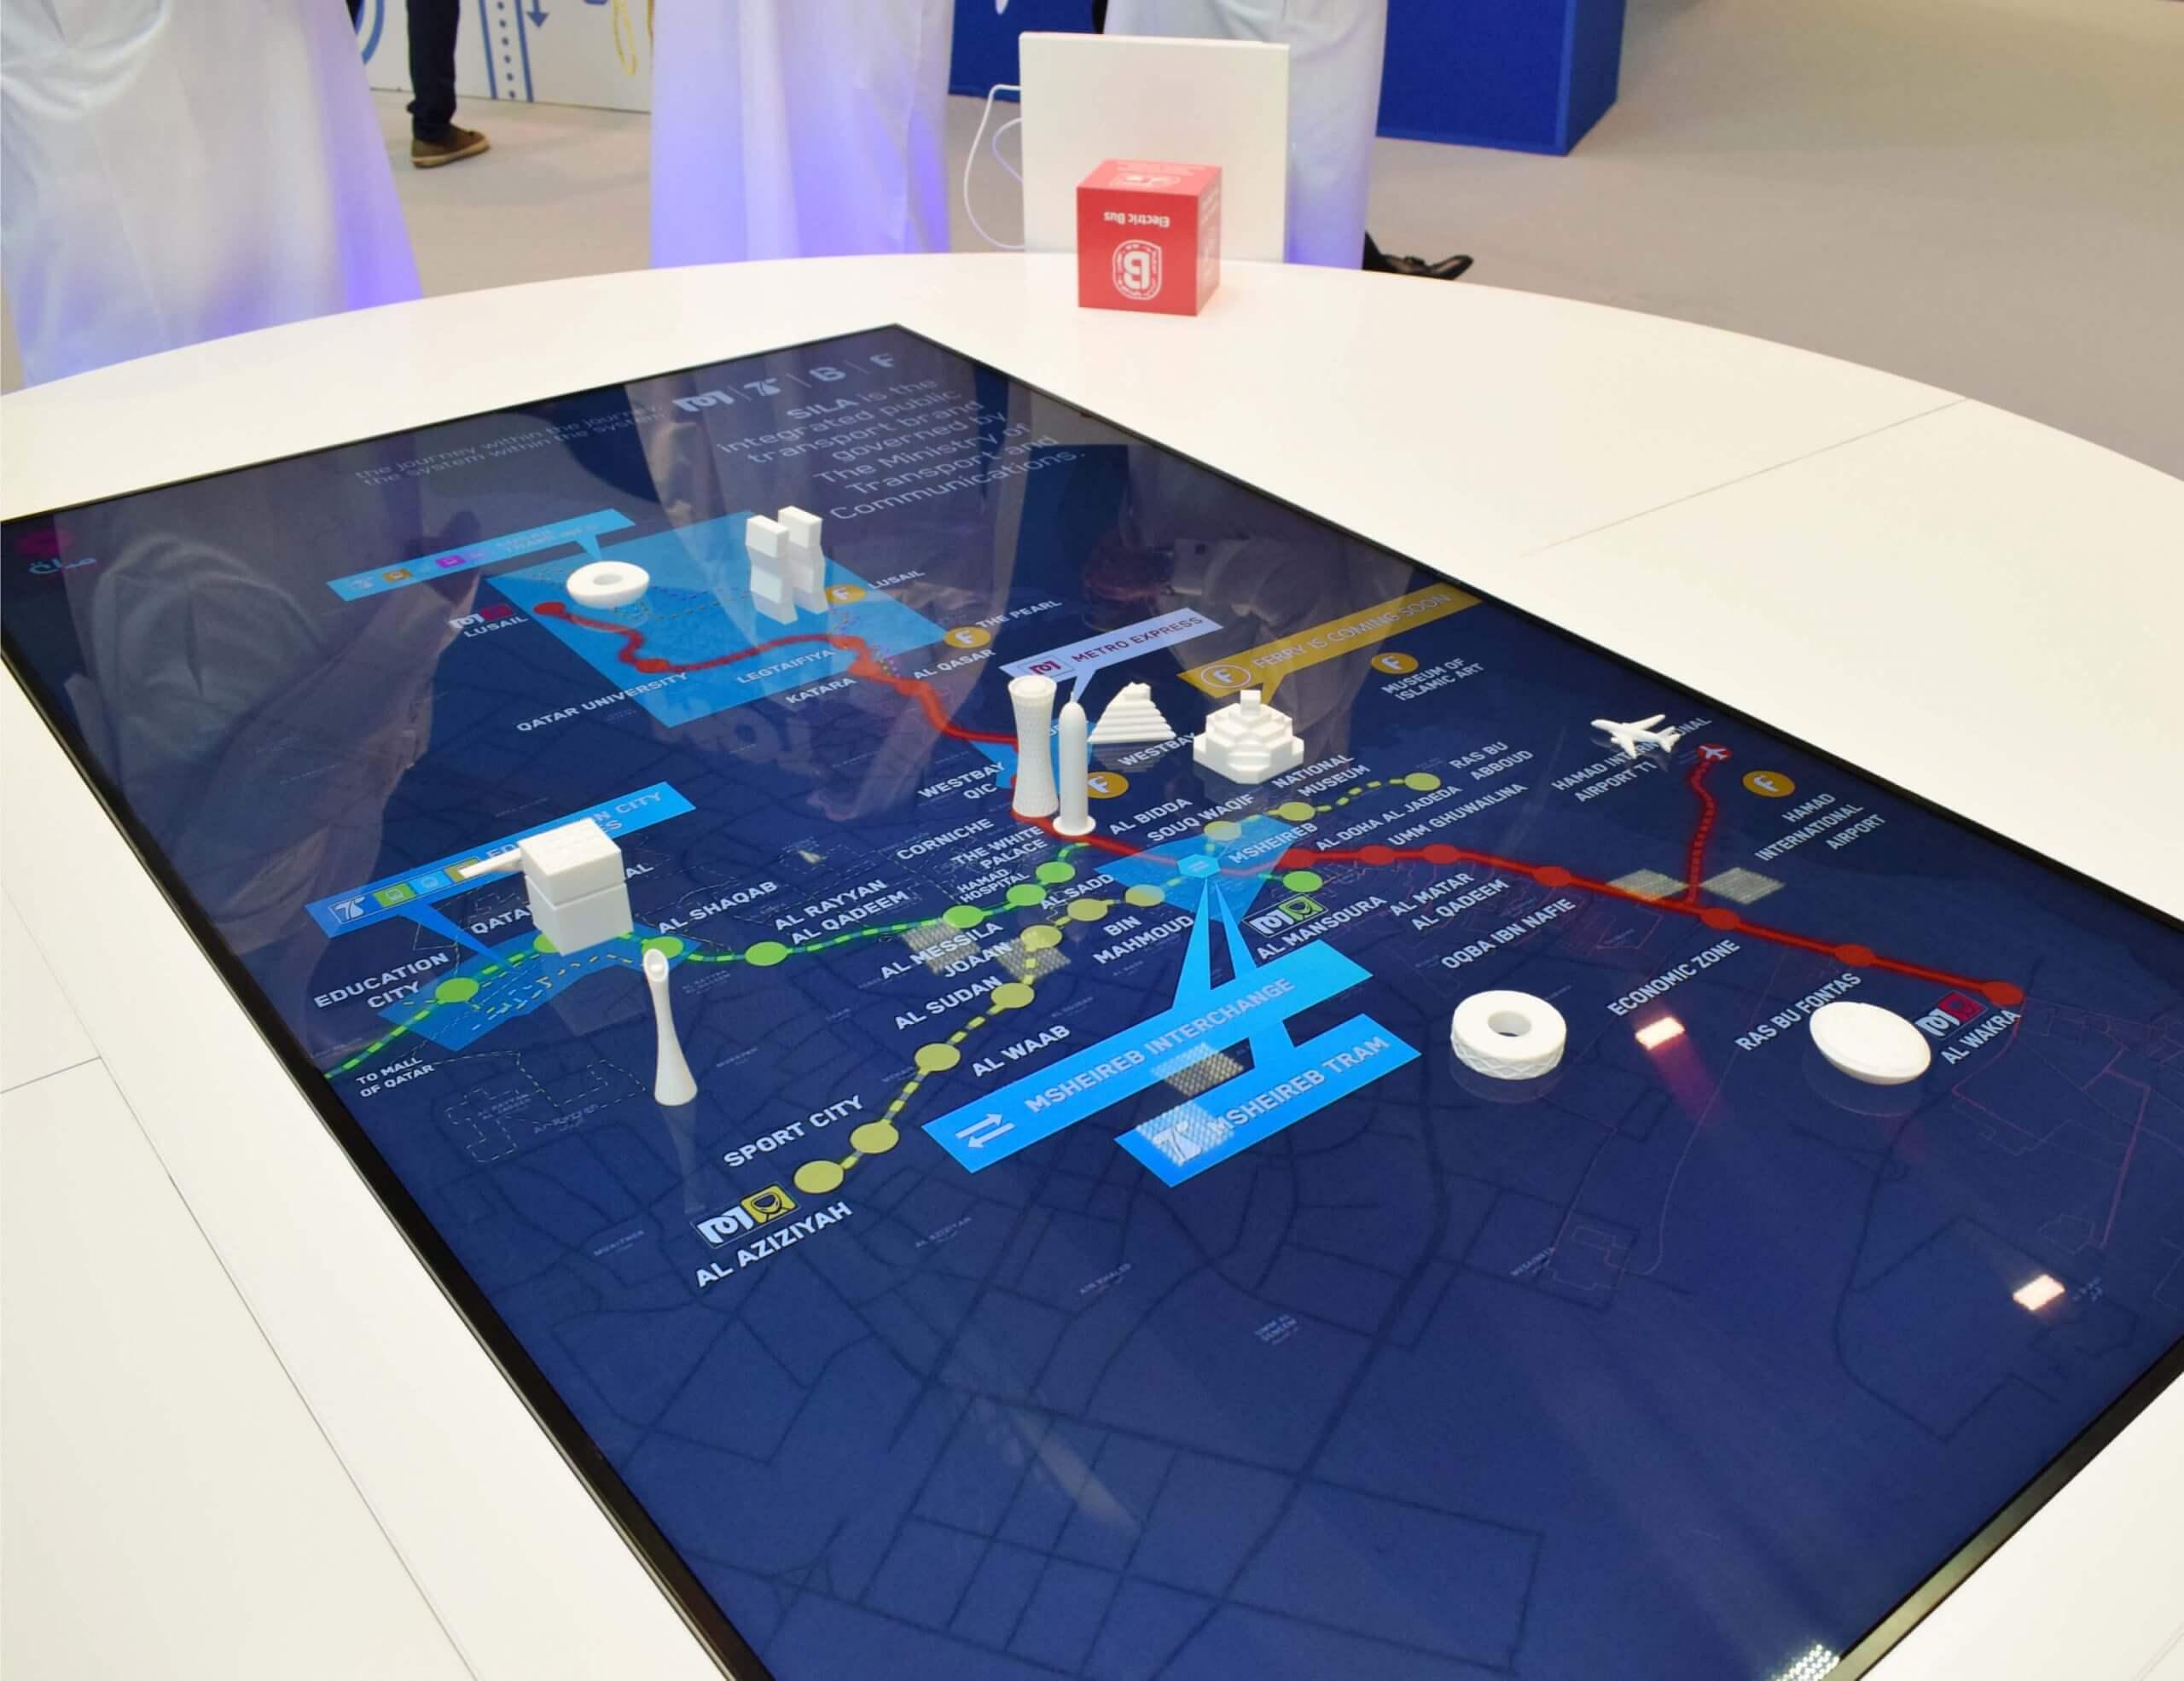 Public Transportation Interactive Display